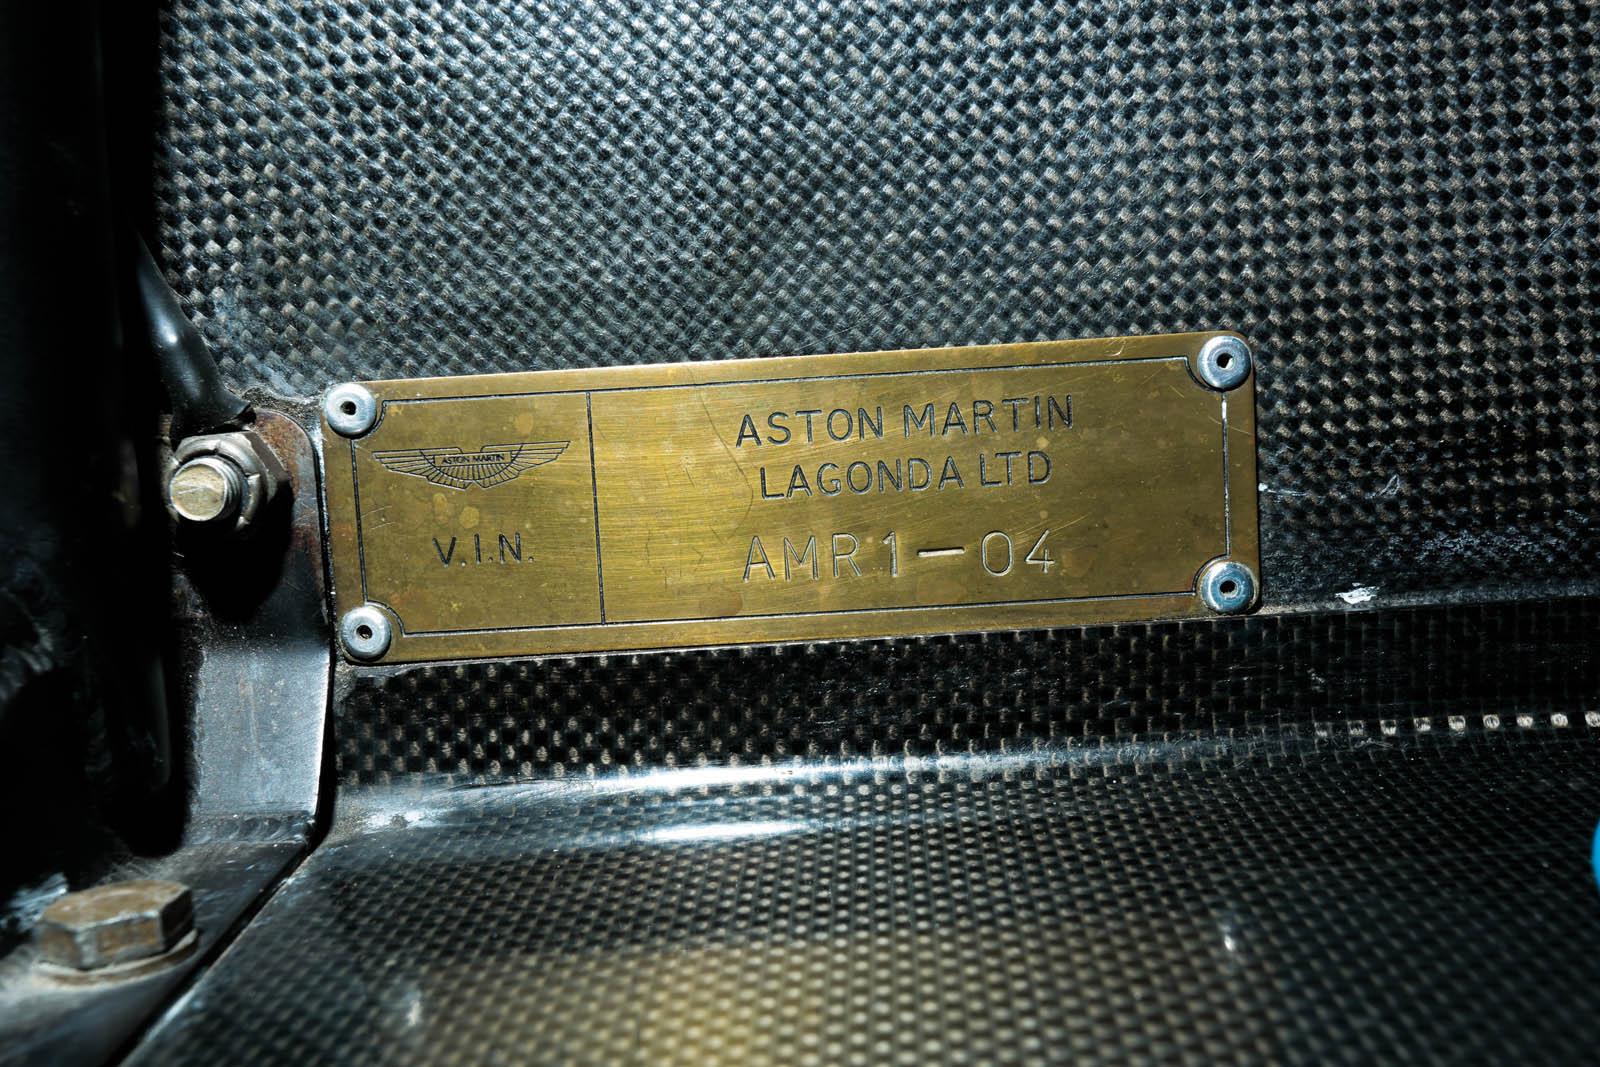 1989-aston-martin-amr1-mo17_r172_007 copy